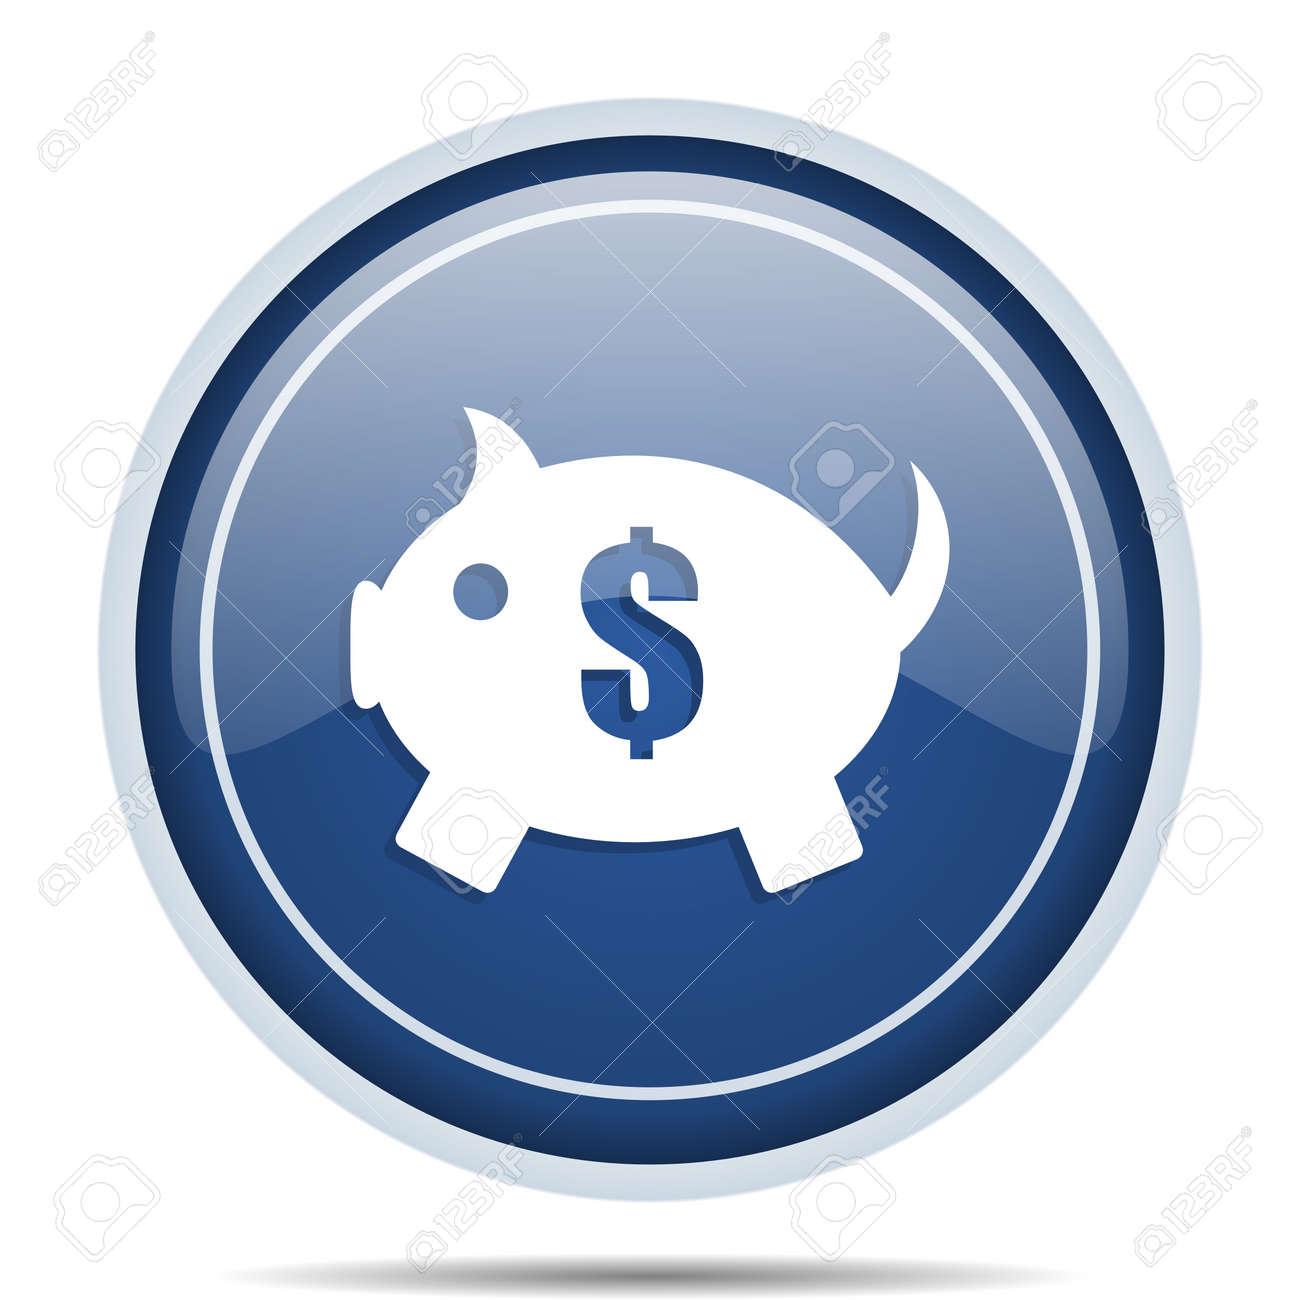 Blauwe Design Bank.Piggy Bank Blauwe Ronde Web Pictogram Cirkel Geisoleerde Internet